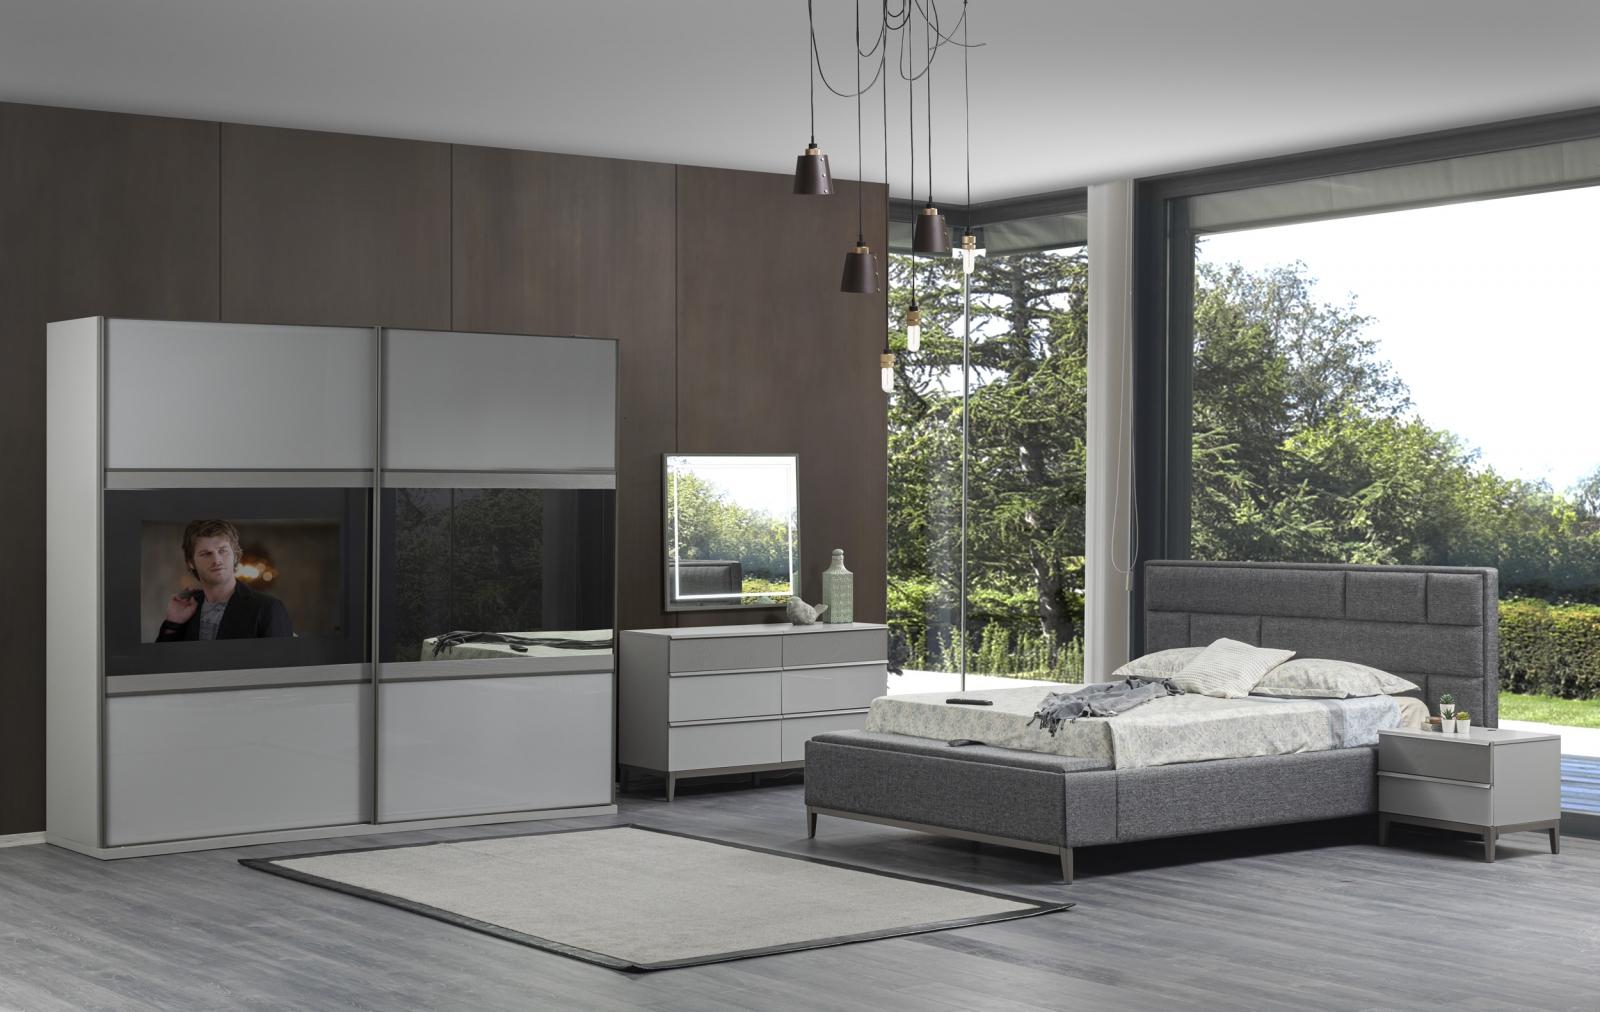 Salda Tv'li Yatak Odası